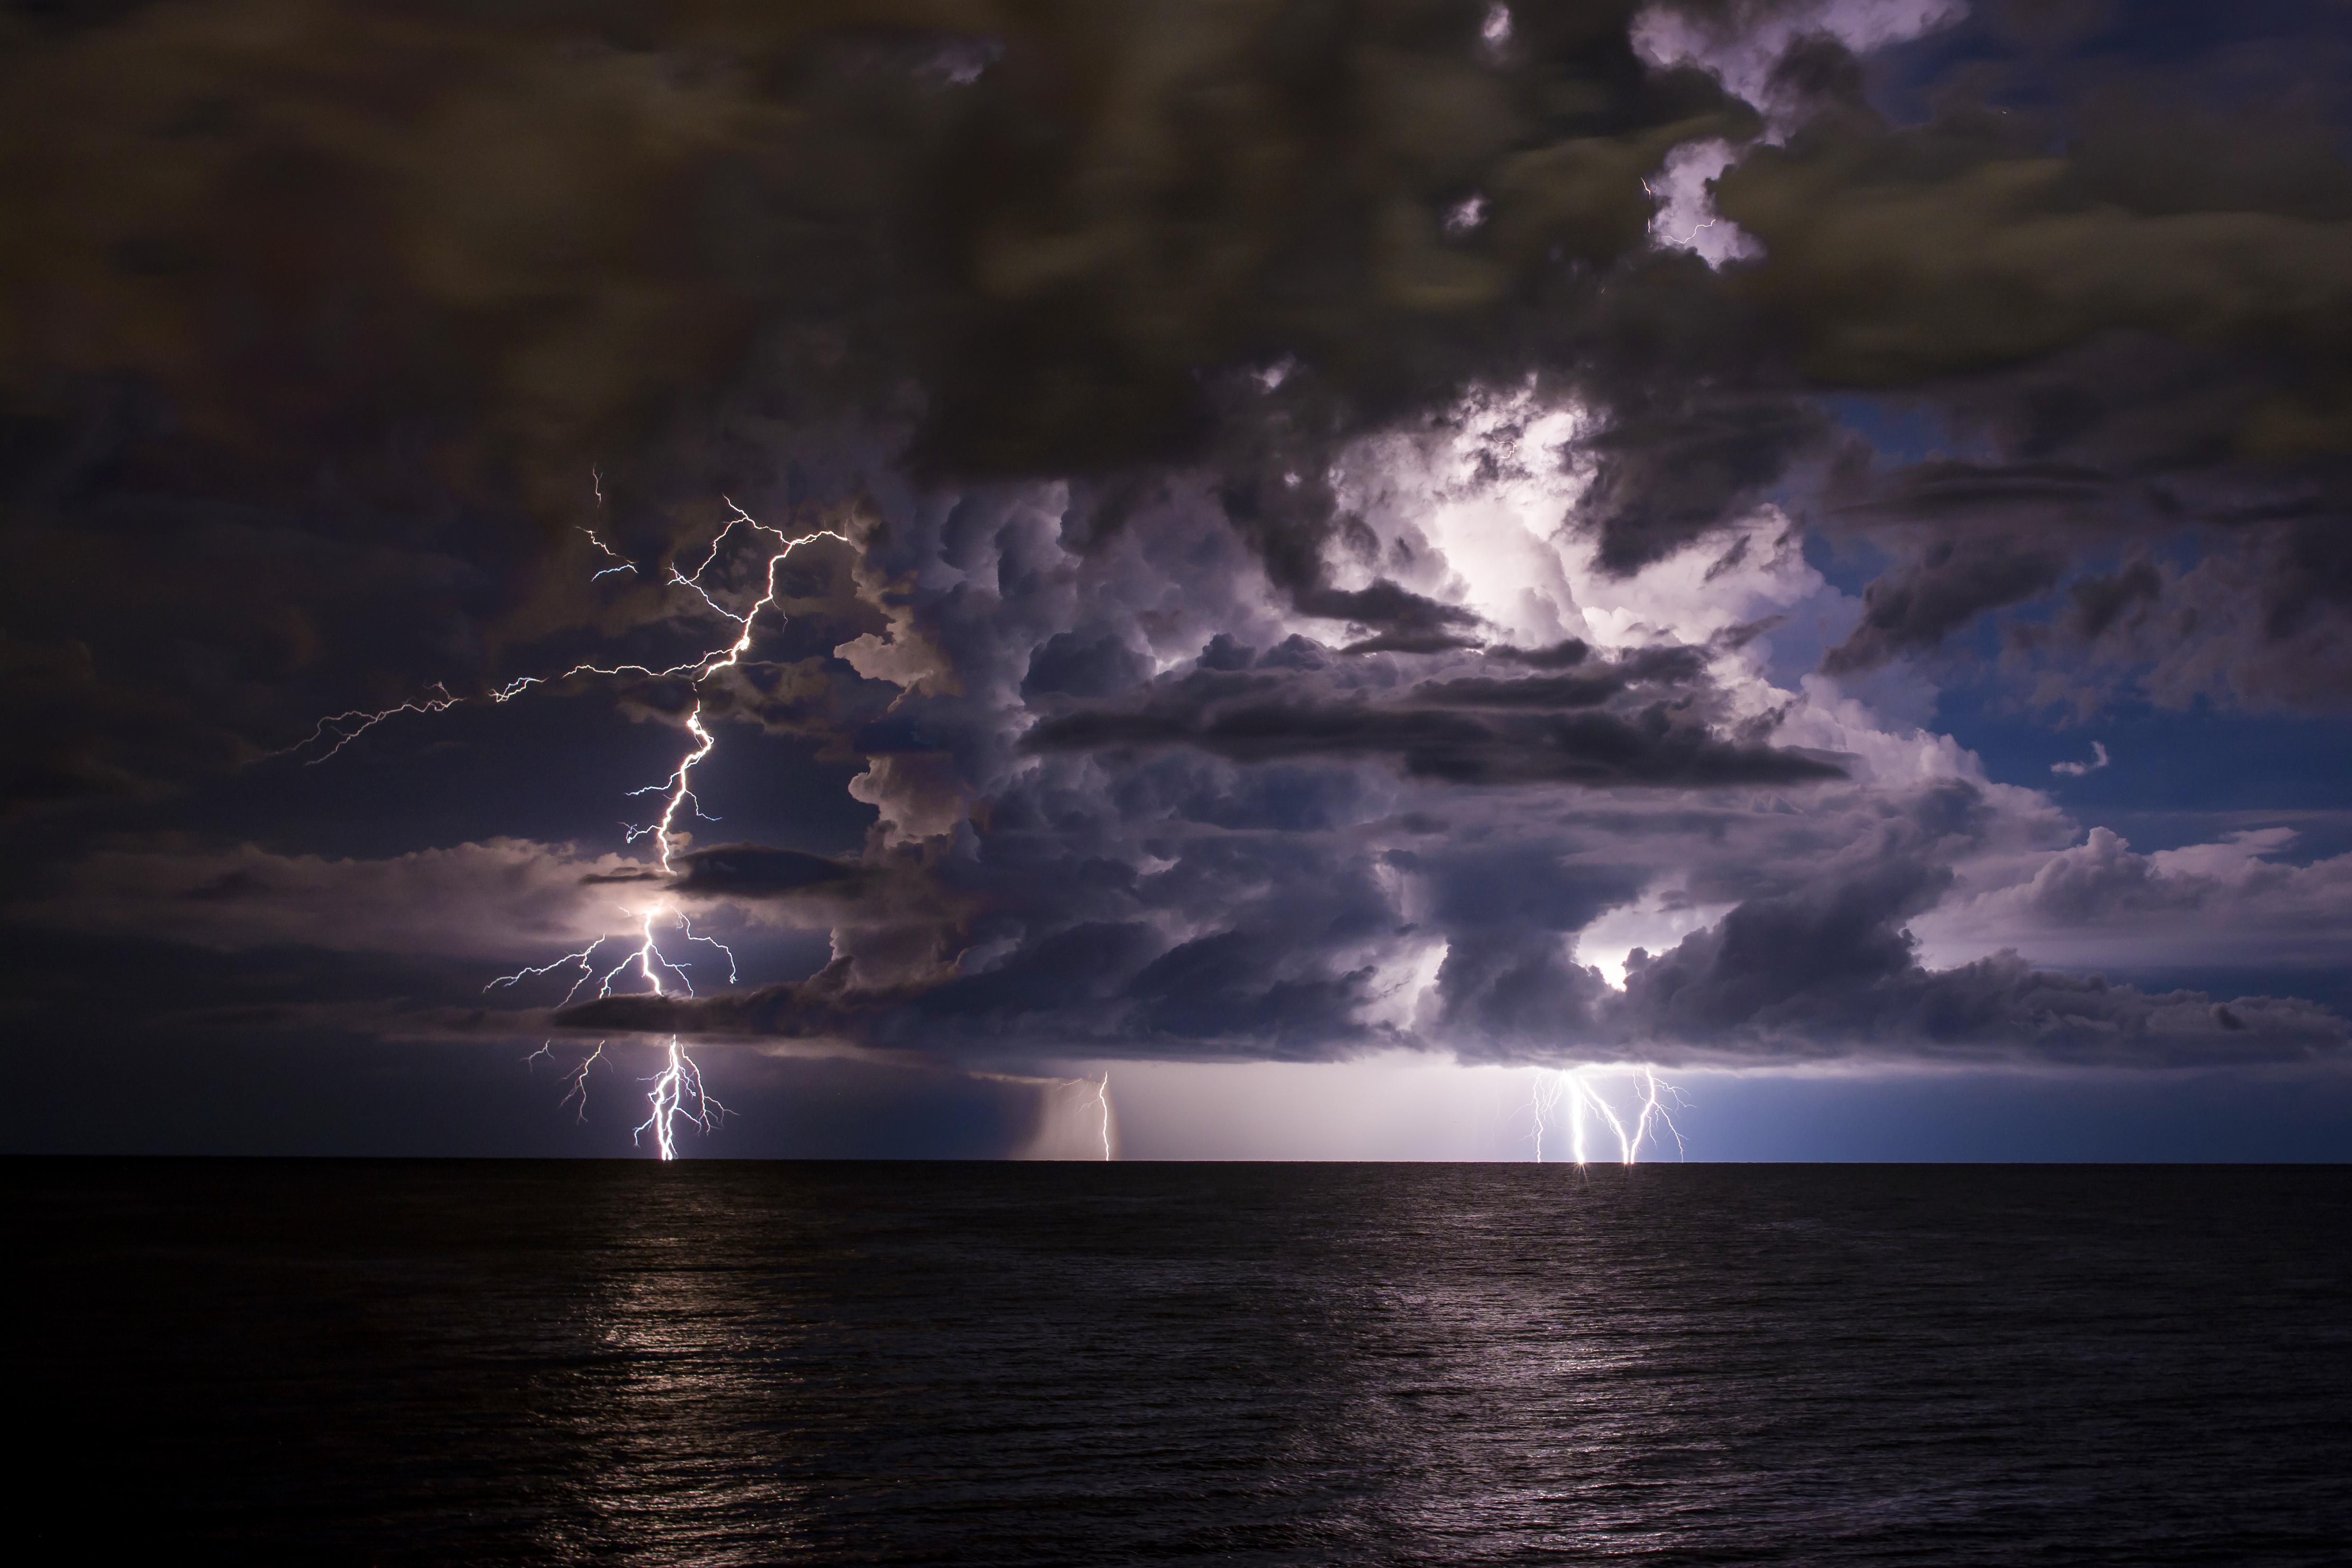 rain shower lightning 4k 1615197629 - Rain Shower Lightning 4k - Rain Shower Lightning 4k wallpapers